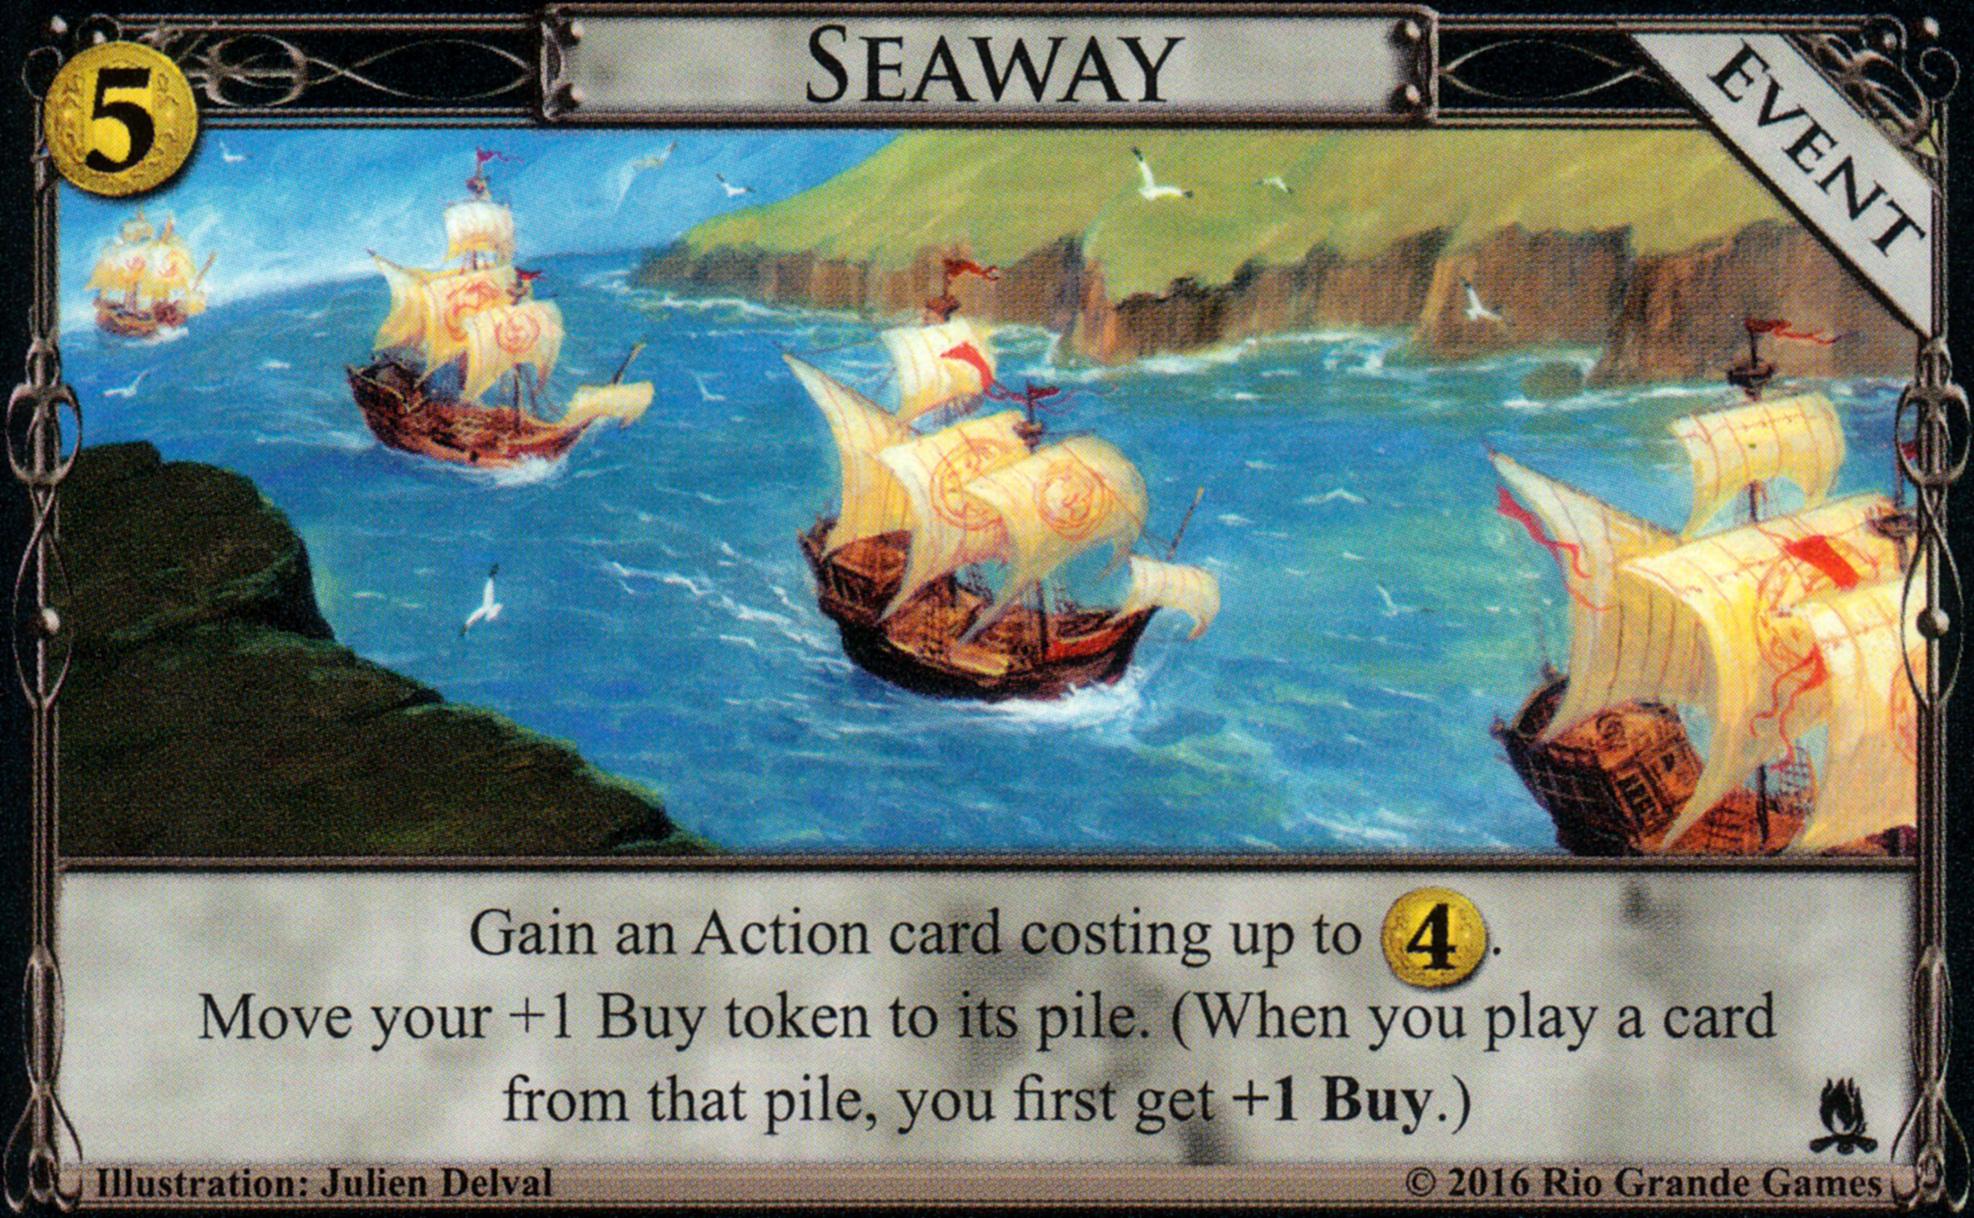 Seaway